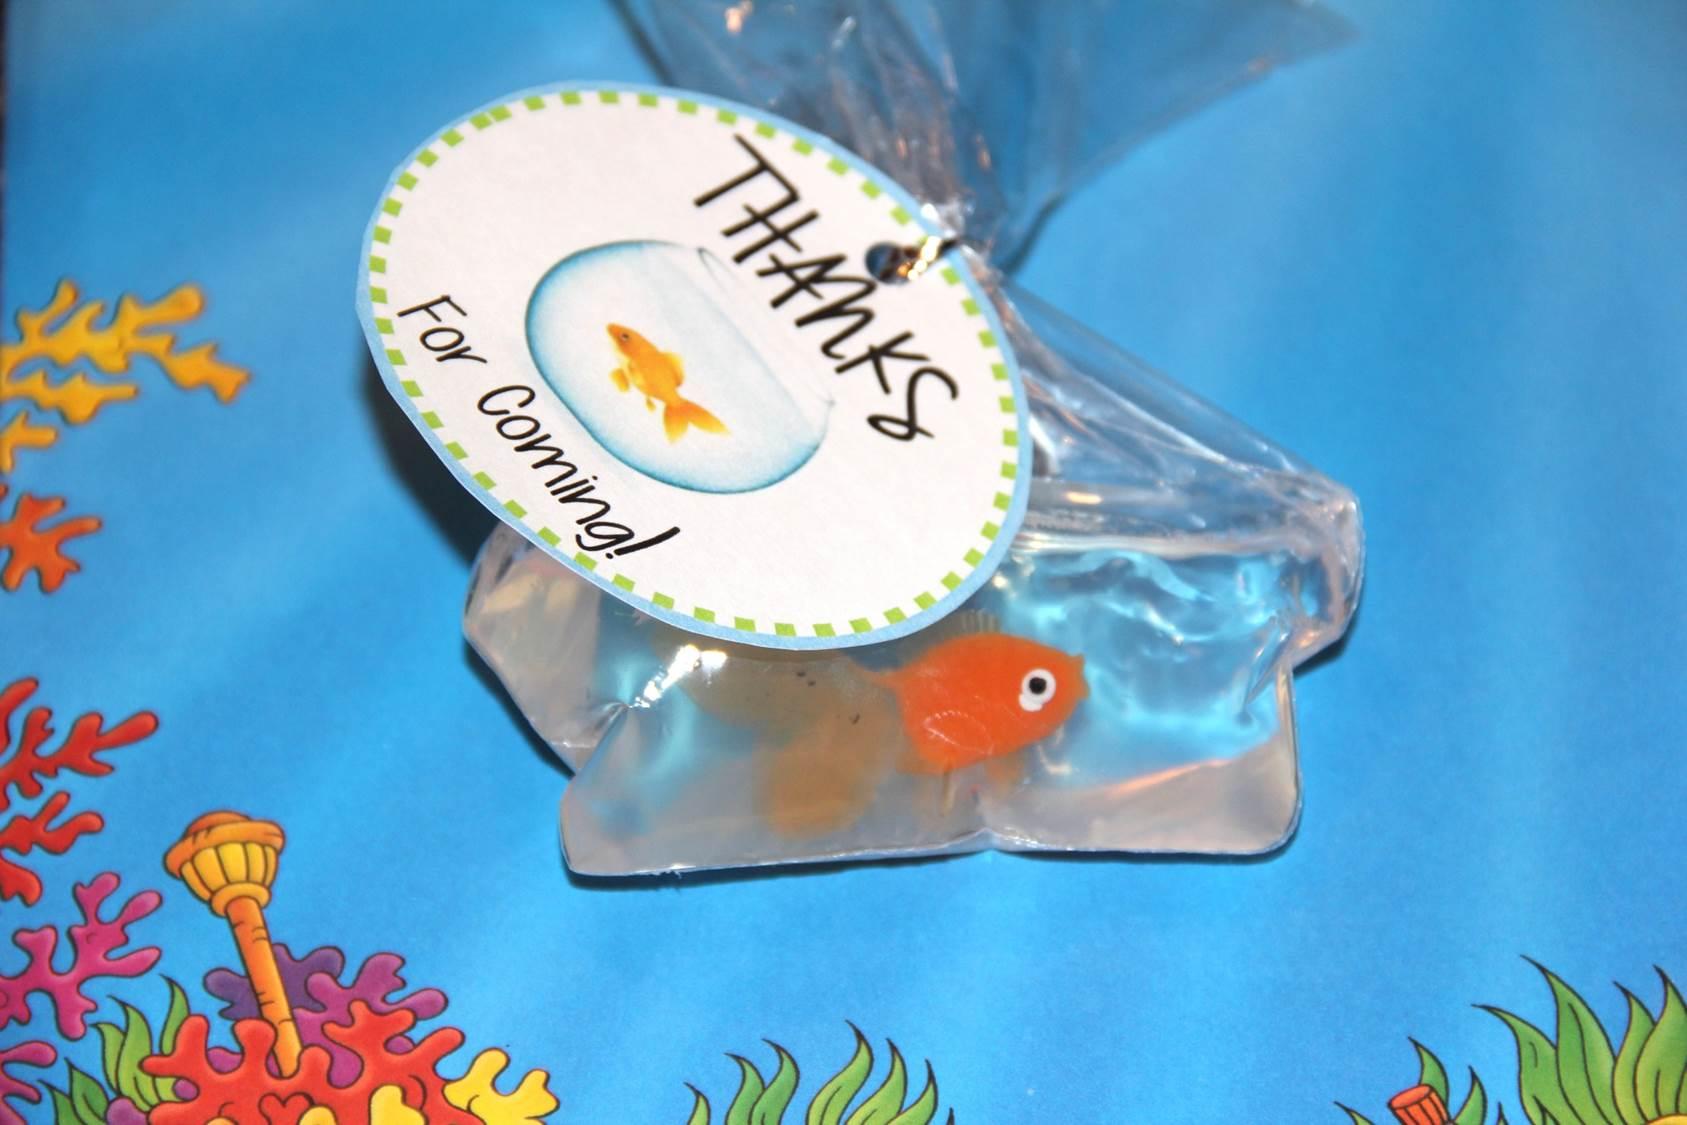 Goldfishsoap